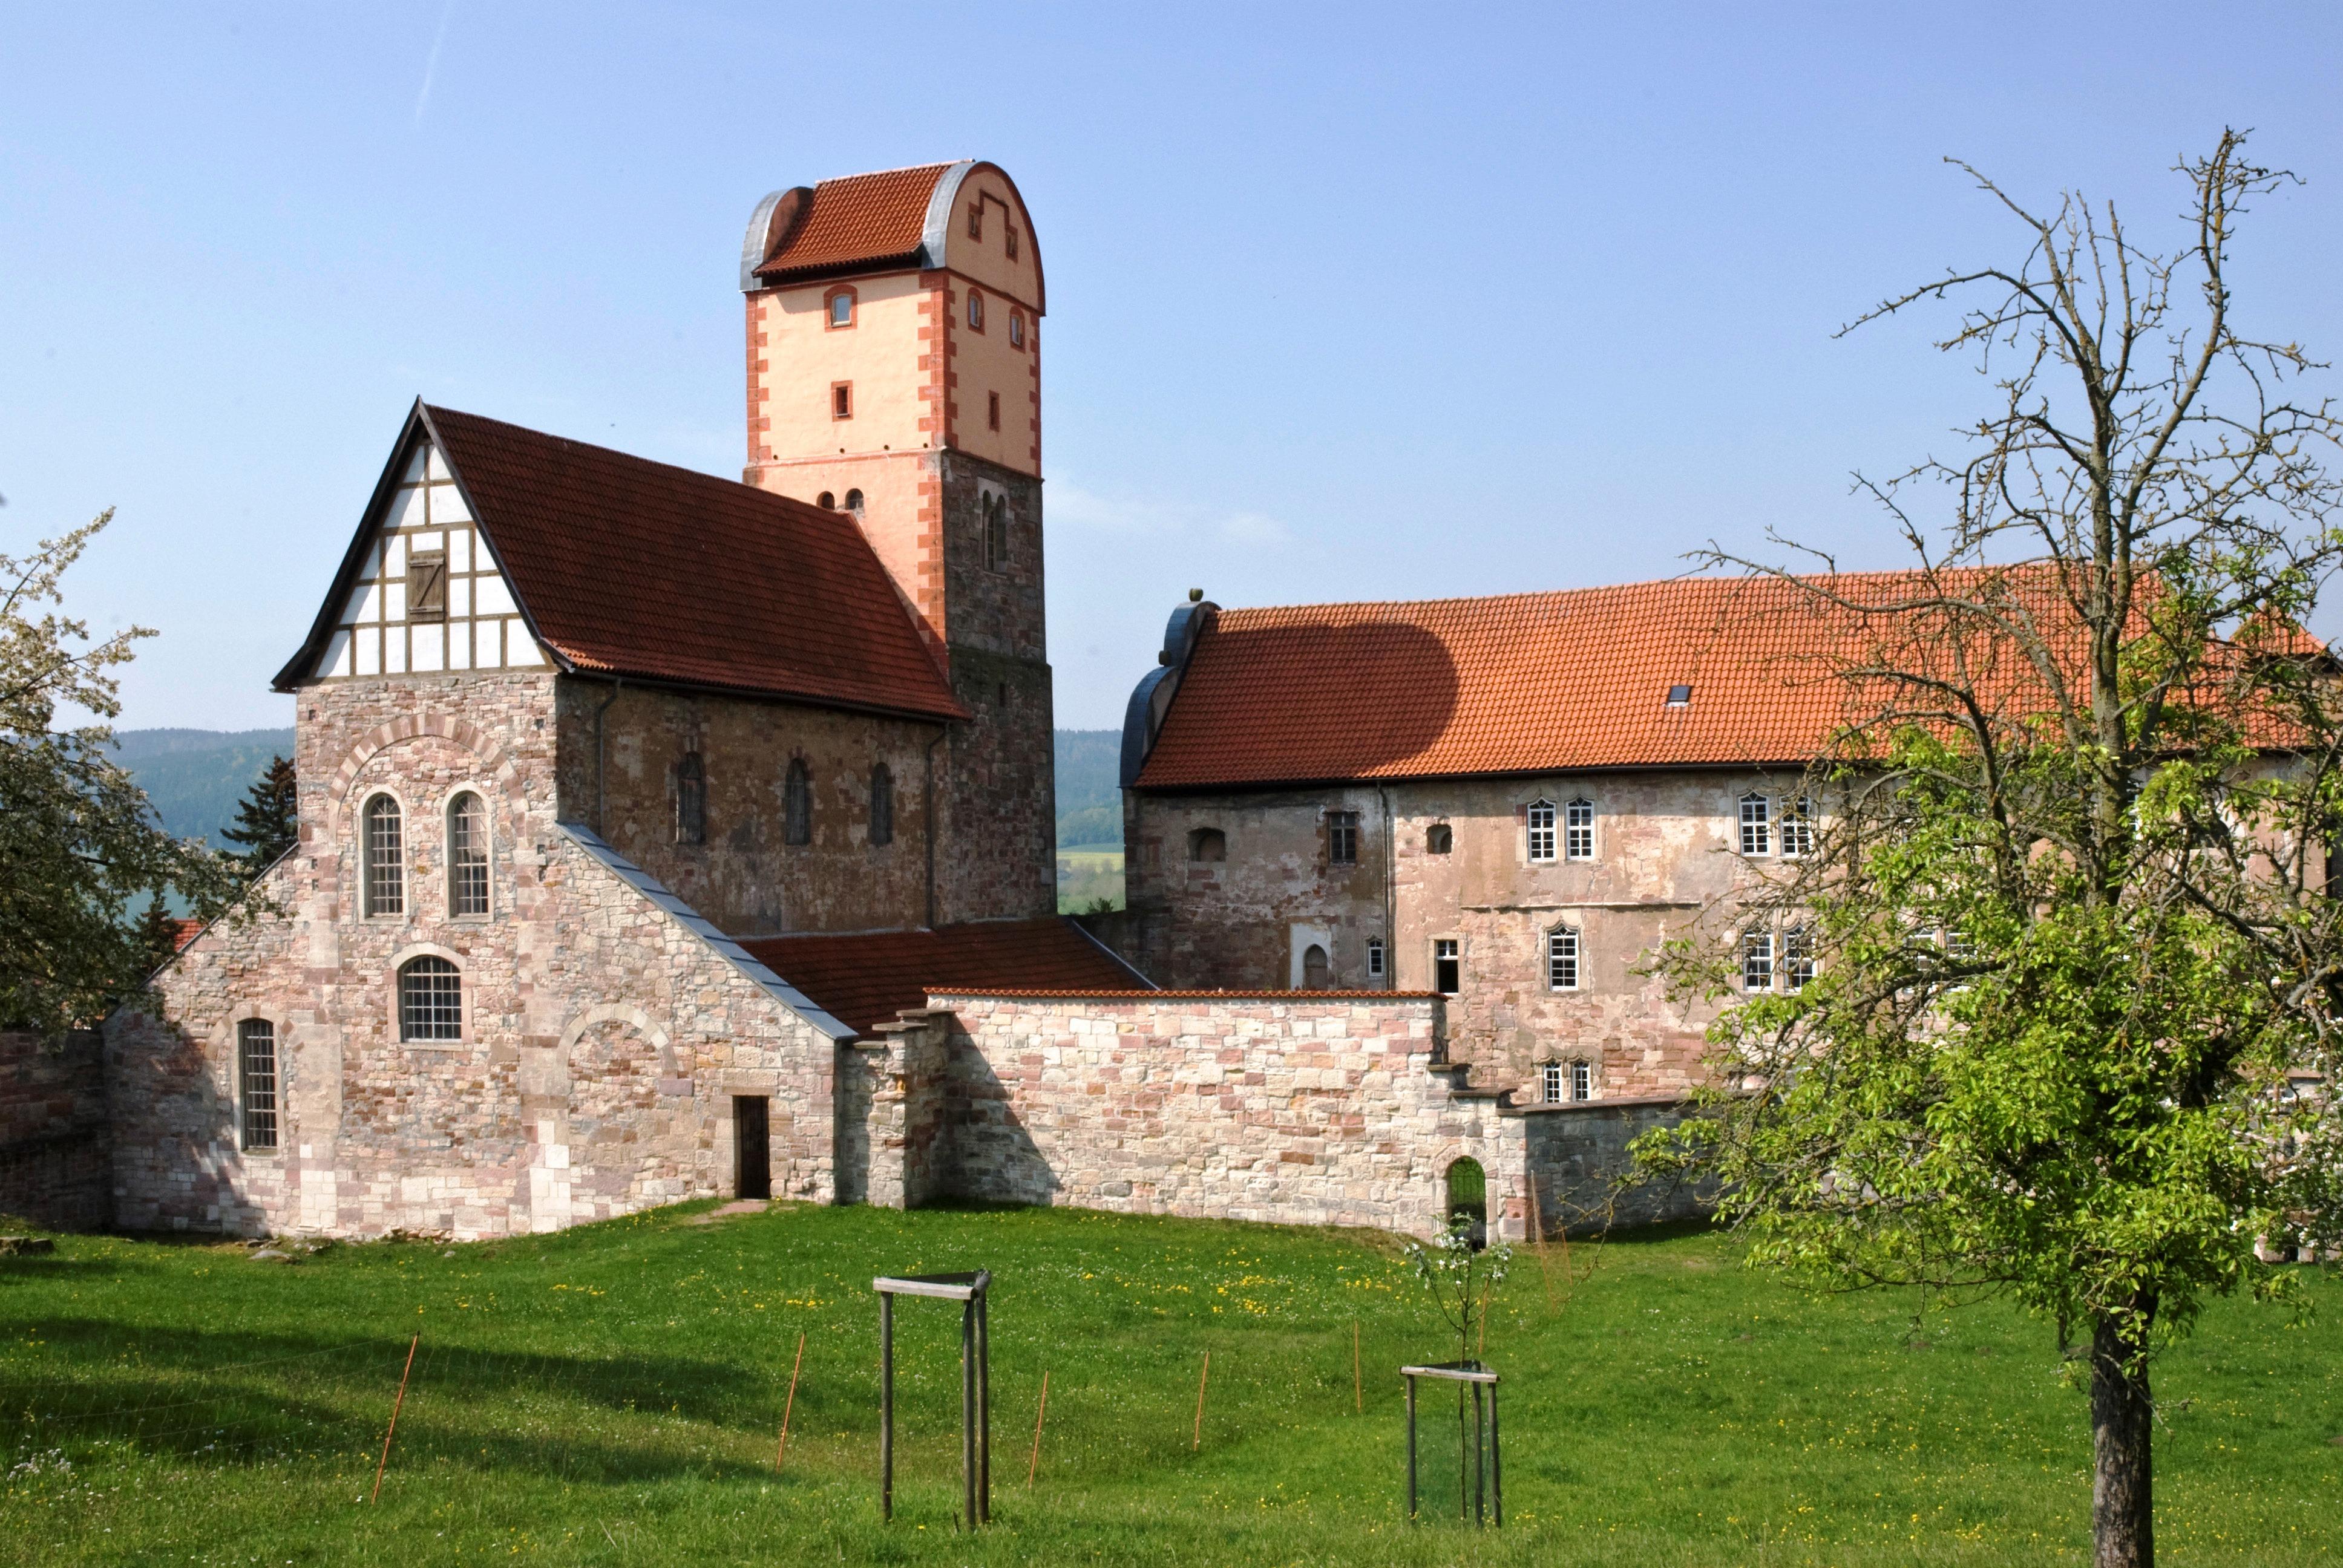 Bild: Schloss und Basilika